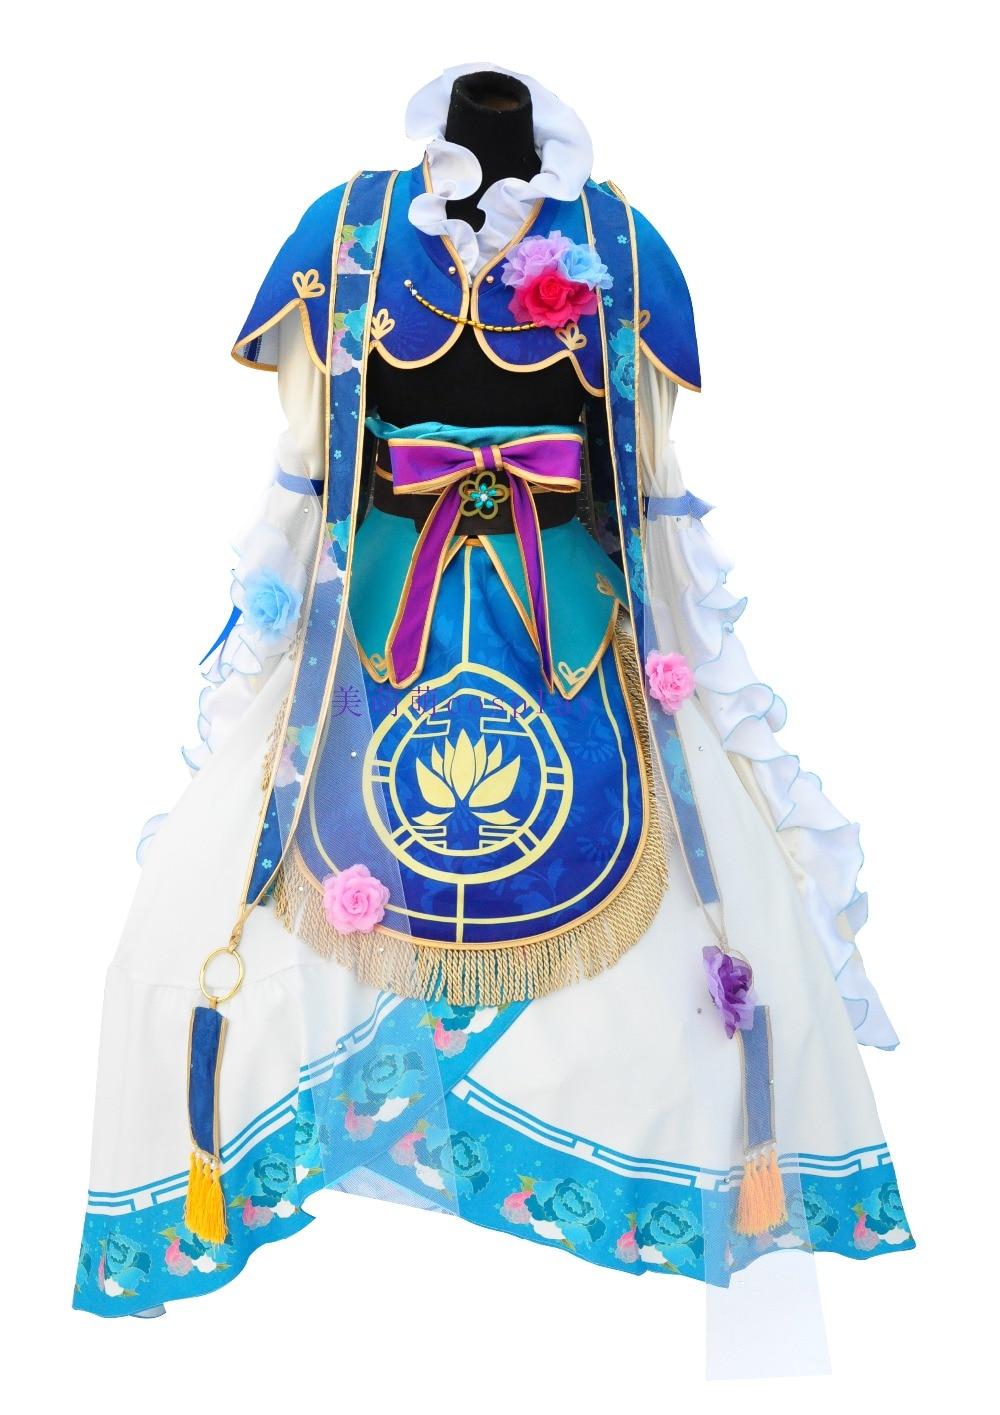 LoveLive! Eli Ayase Seven Lucky Gods Awaken Cosplay Costume Halloween Dress+hair accessories+crown+Shoes